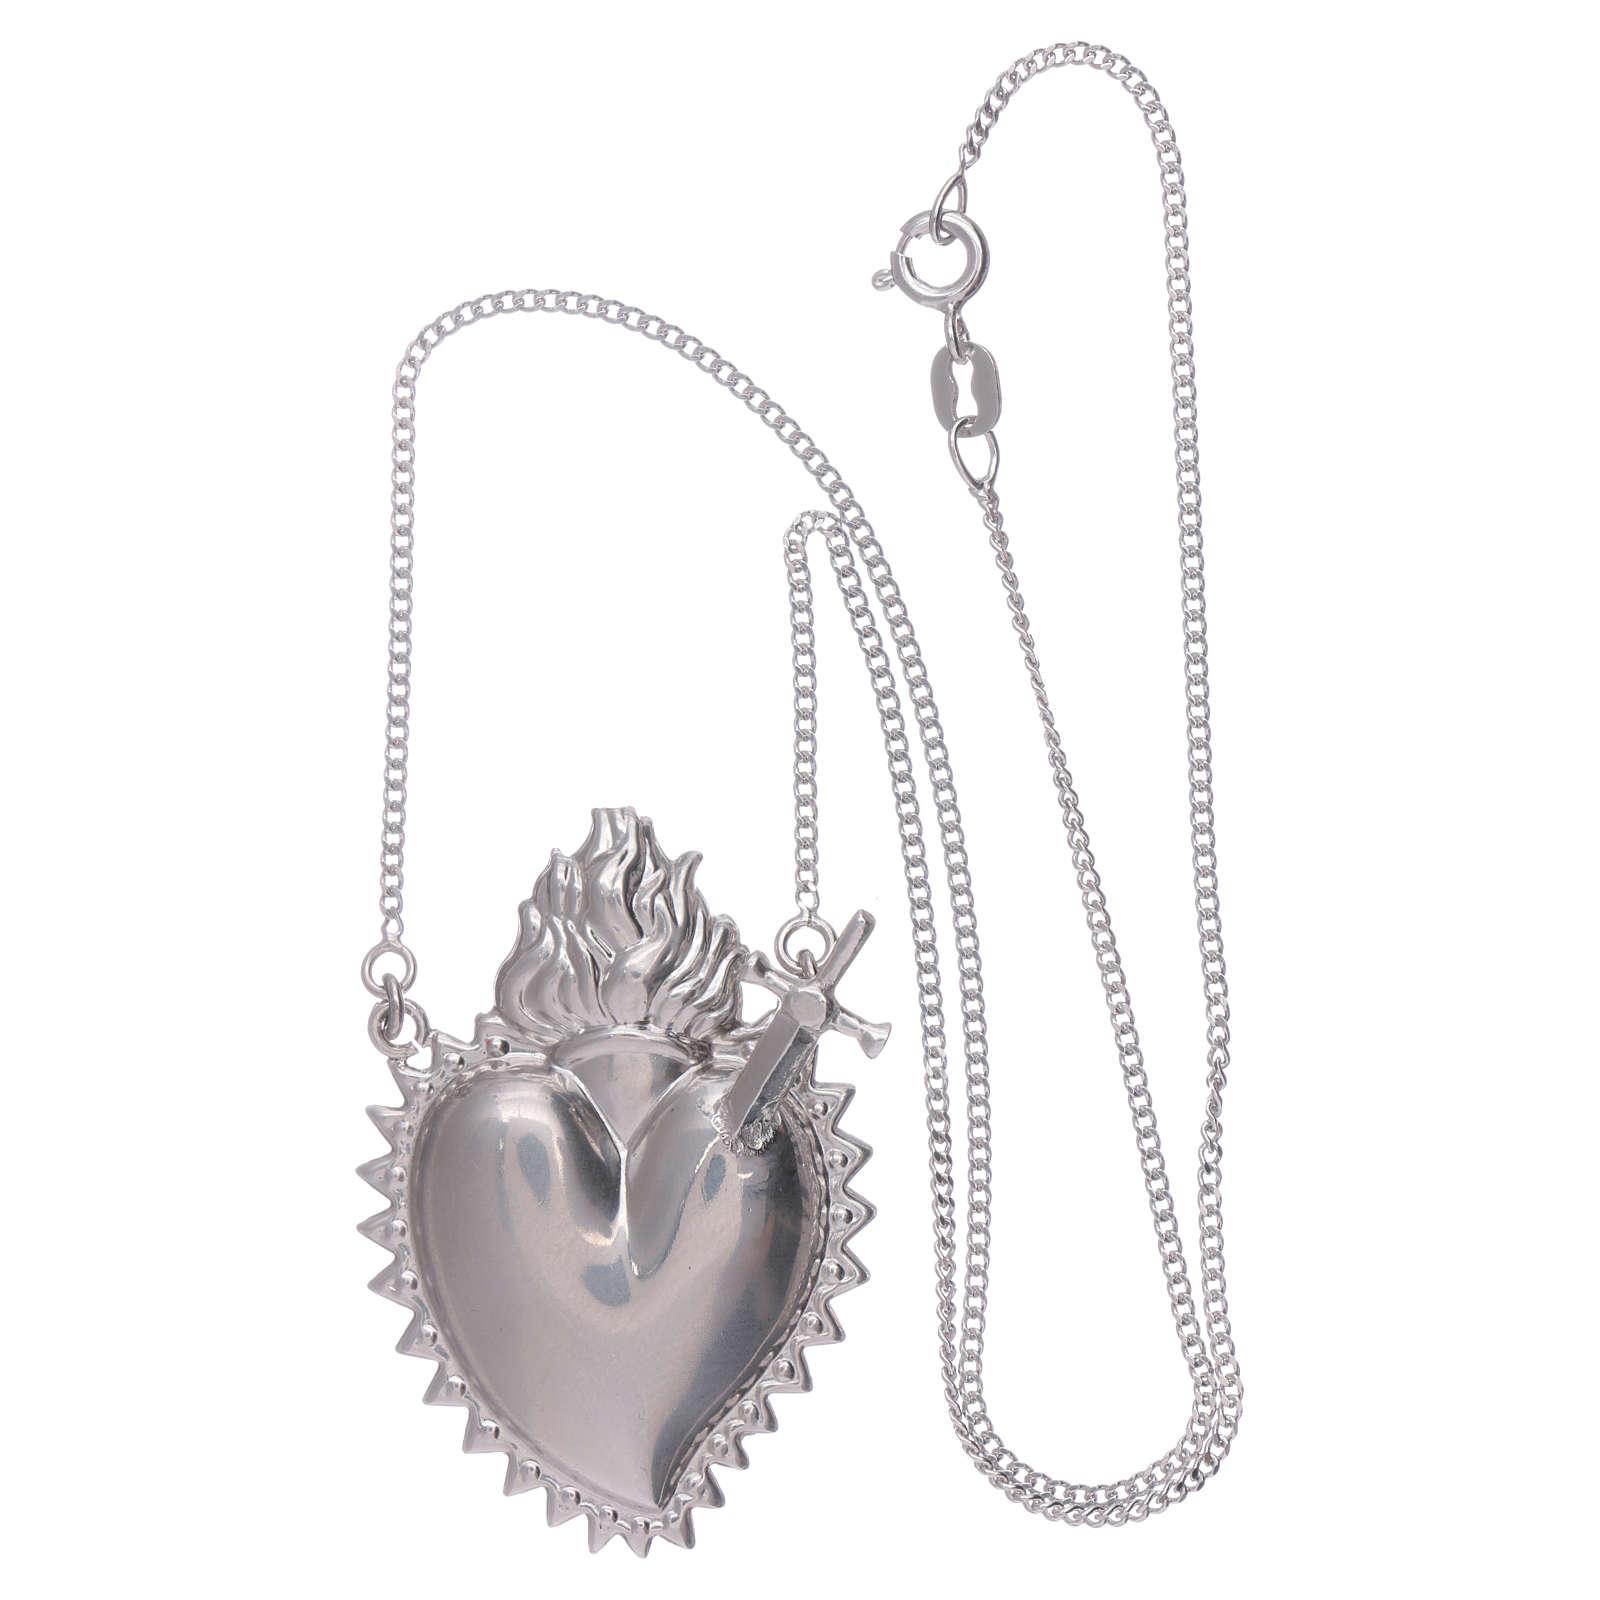 Girocollo argento 925 con cuore votivo con spada 4